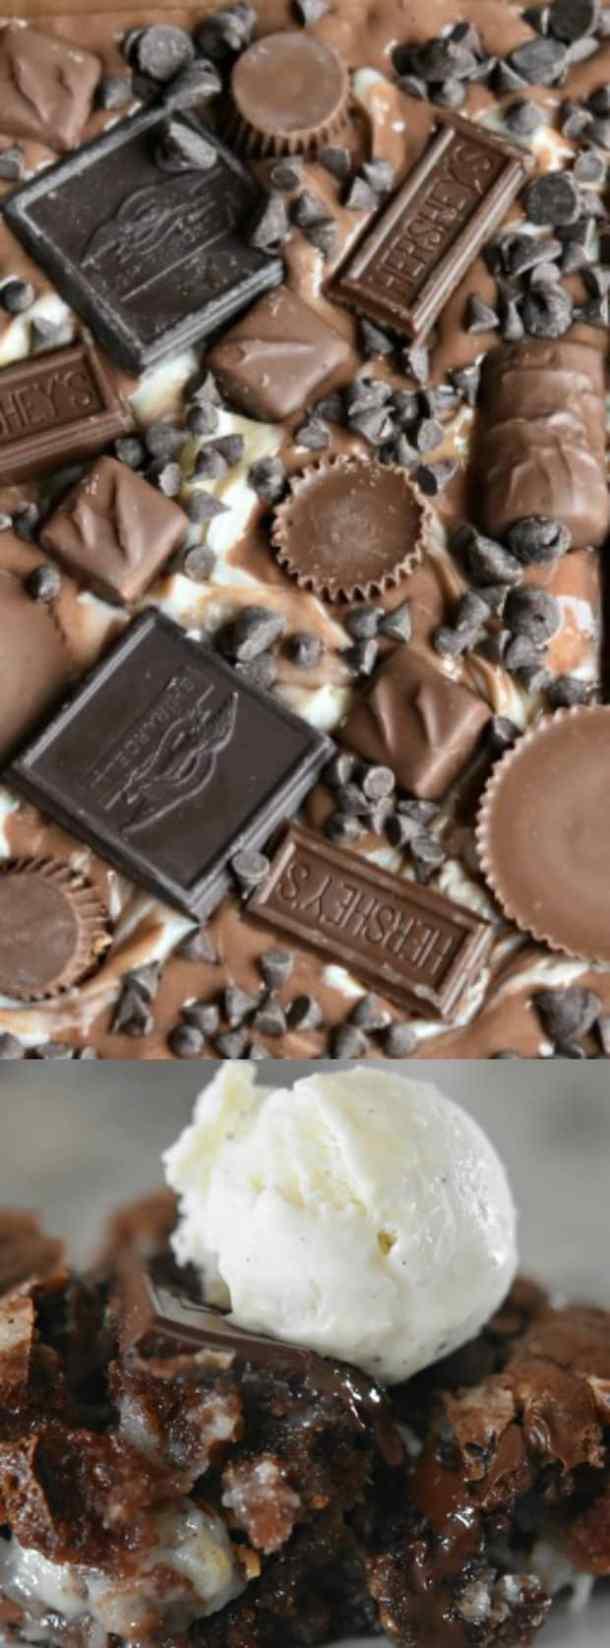 chocolate explosion earthquake cake with cream cheese swirl